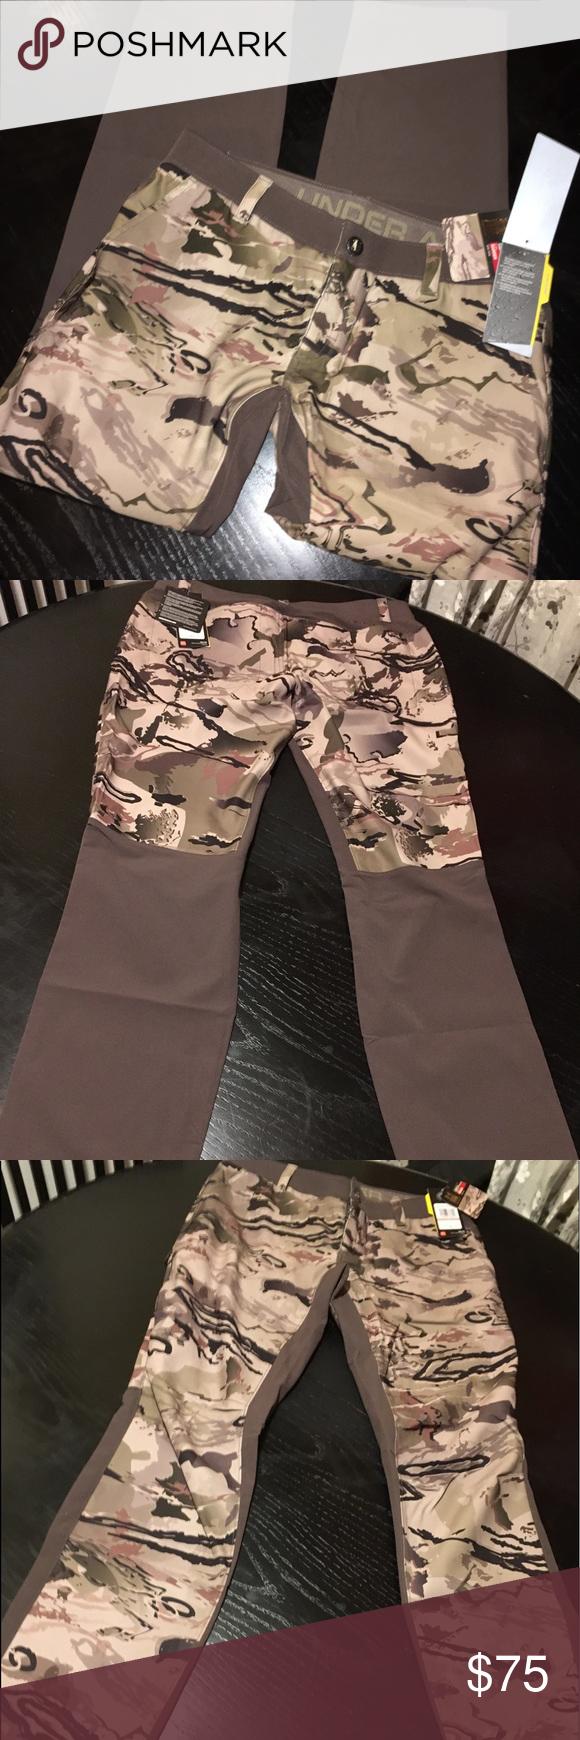 92f19453c6596 Under Armour Early Season Ridge Reaper Camo Pants Under Armour Women's  Storm1 Ridge Reaper Camo Pants | Size 12 | UA Women's Early Season Field |  Storm1 ...